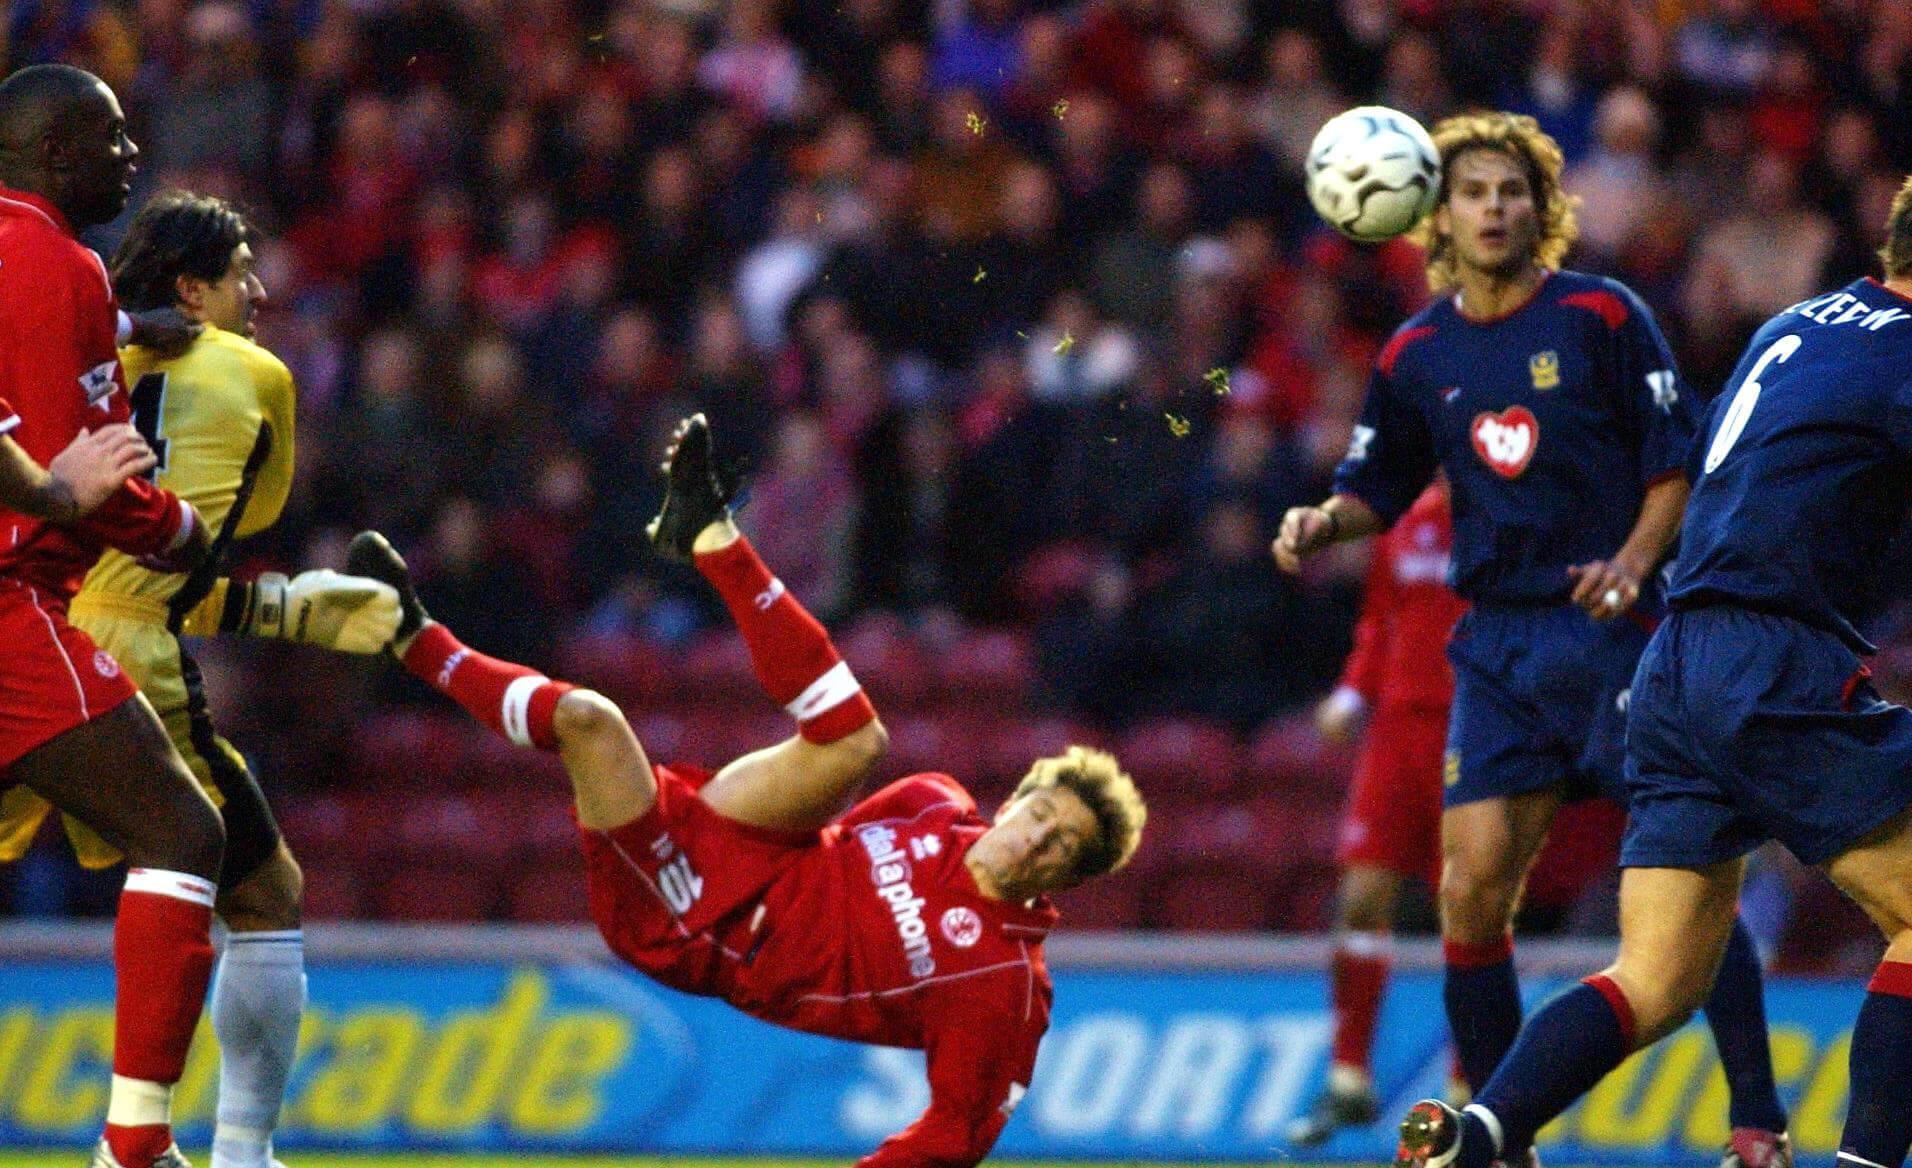 Juninho of Middlesbrough